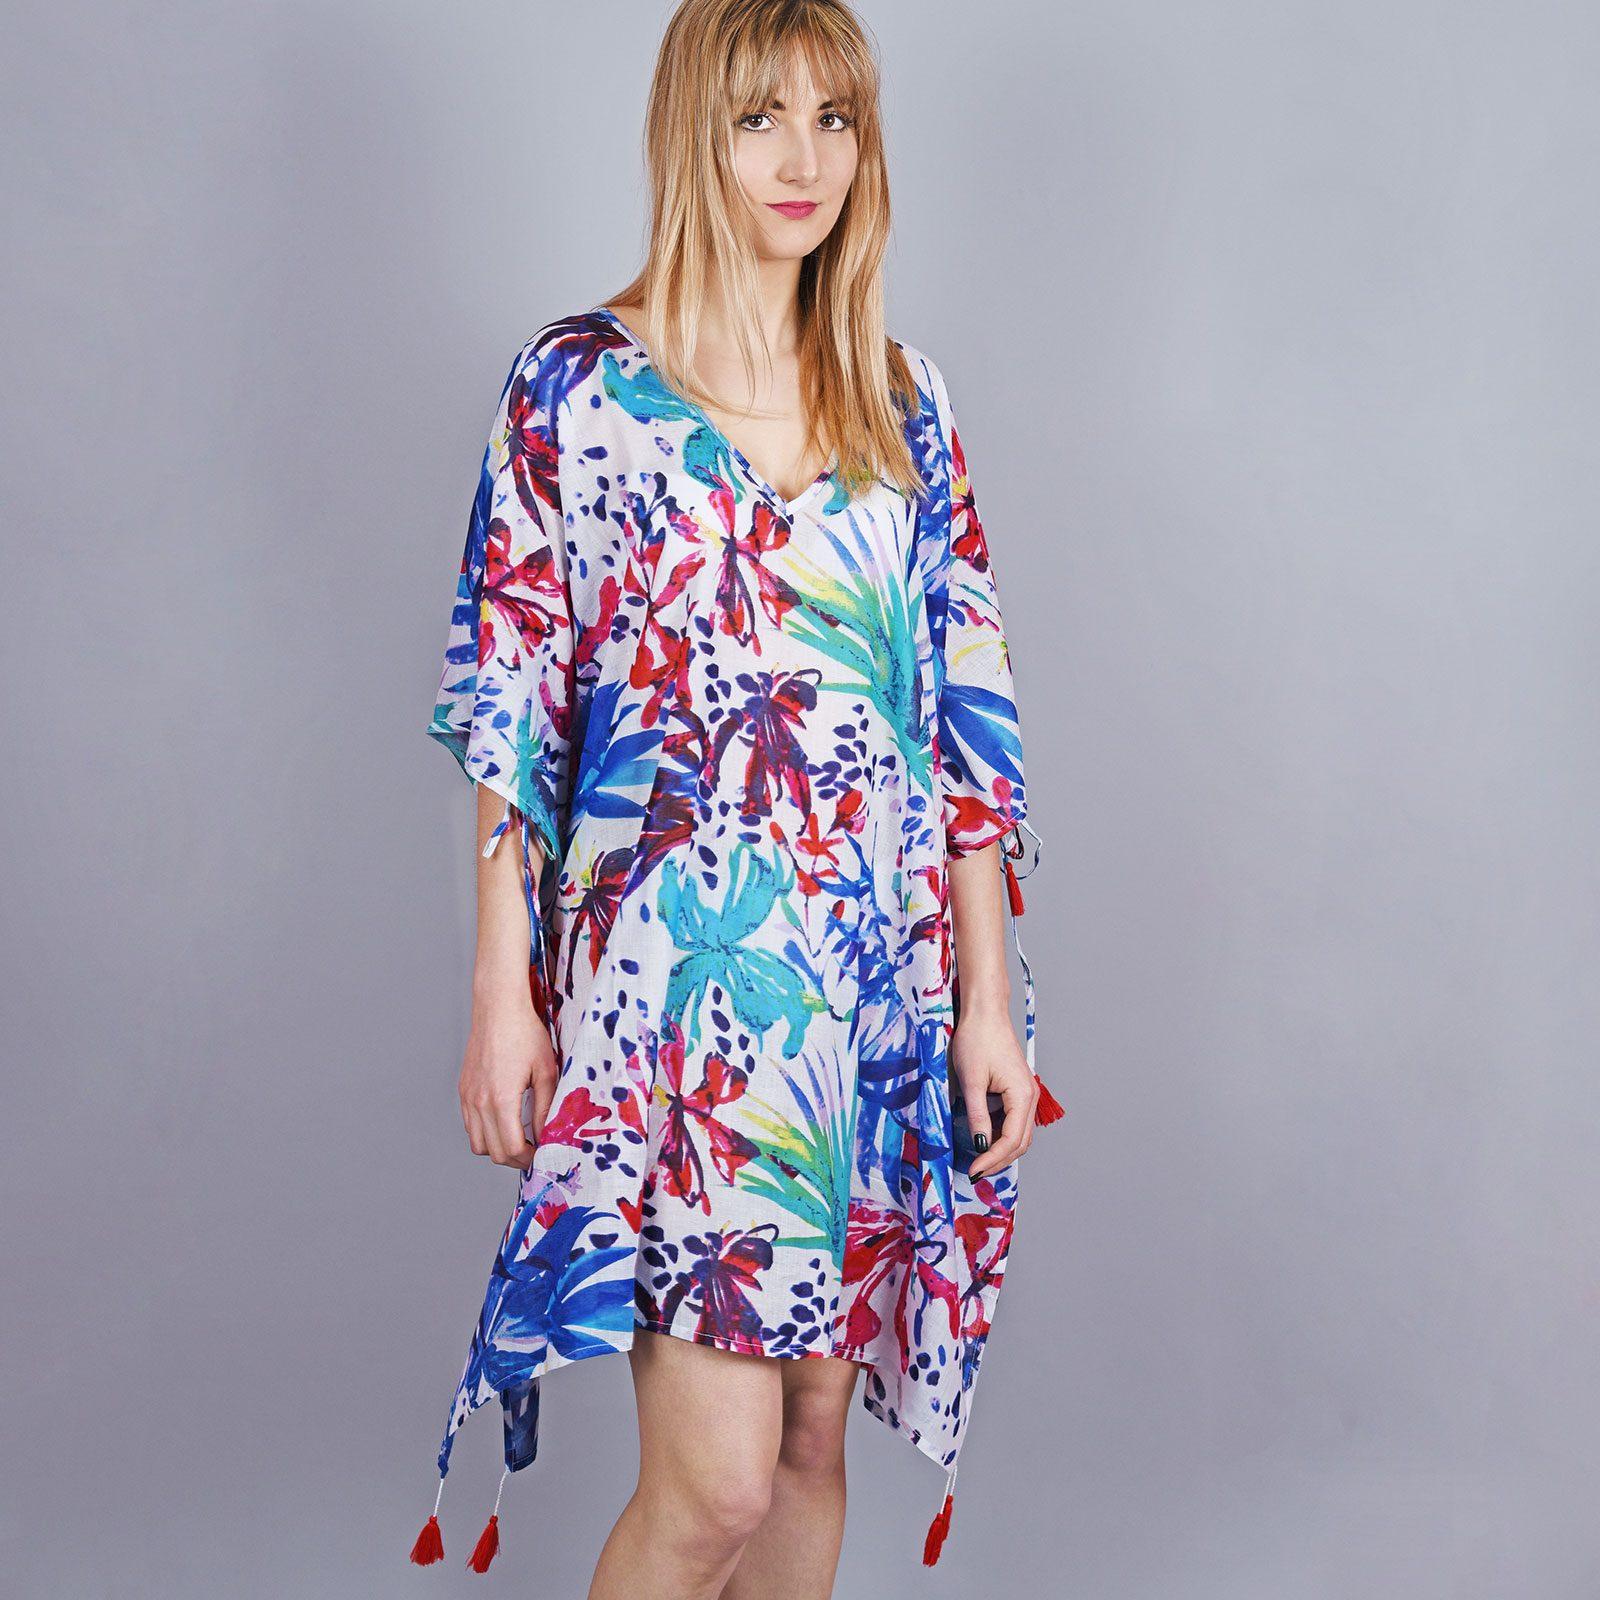 http://lookbook.allee-du-foulard.fr/wp-content/uploads/2018/06/AT-04324-VF16-tunique-femme-coton-fleurs-1600x1600.jpg